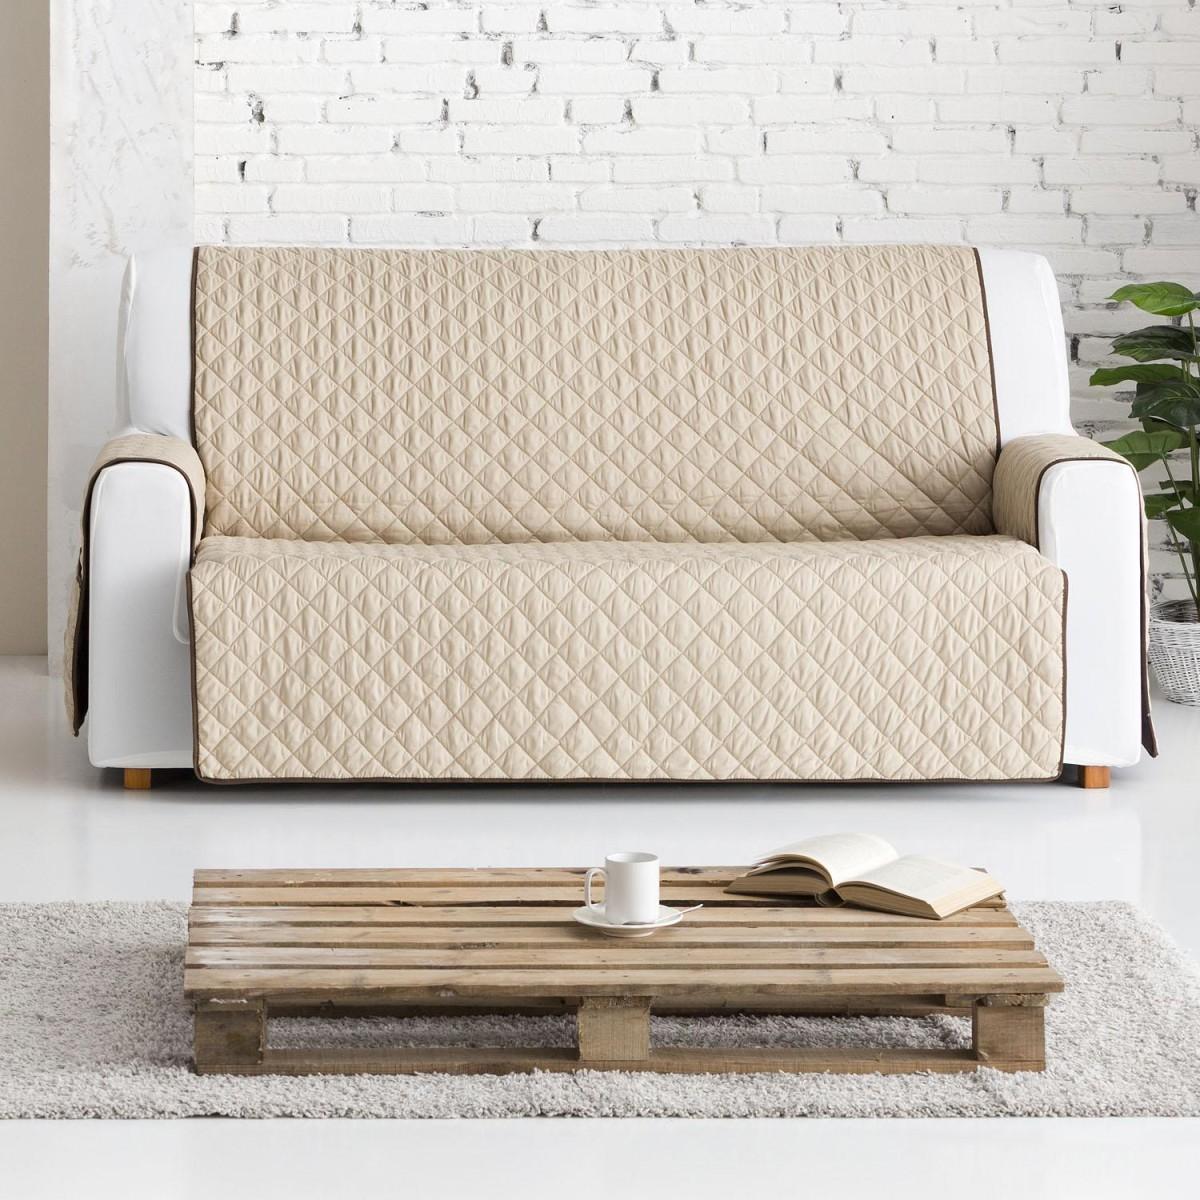 Funda para sof reversible dual quilt eysa - Fundasdesofa com ...